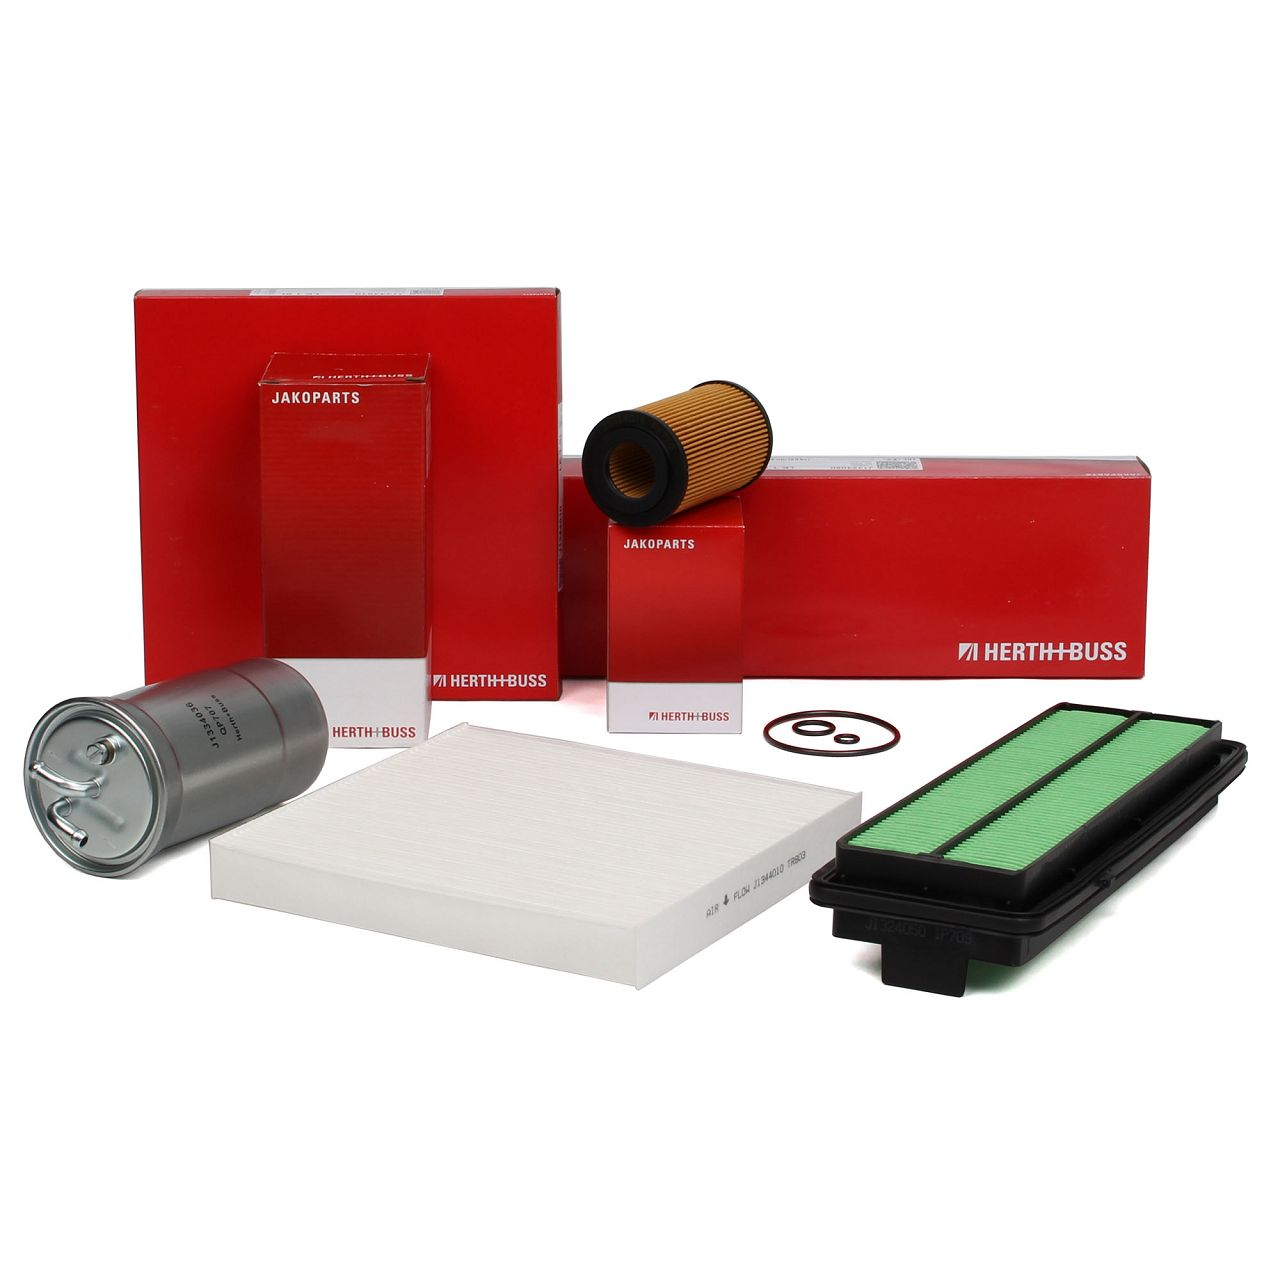 HERTH+BUSS JAKOPARTS Filterset für HONDA ACCORD VII (CL CM) 2.2 i-CTDi 140 PS